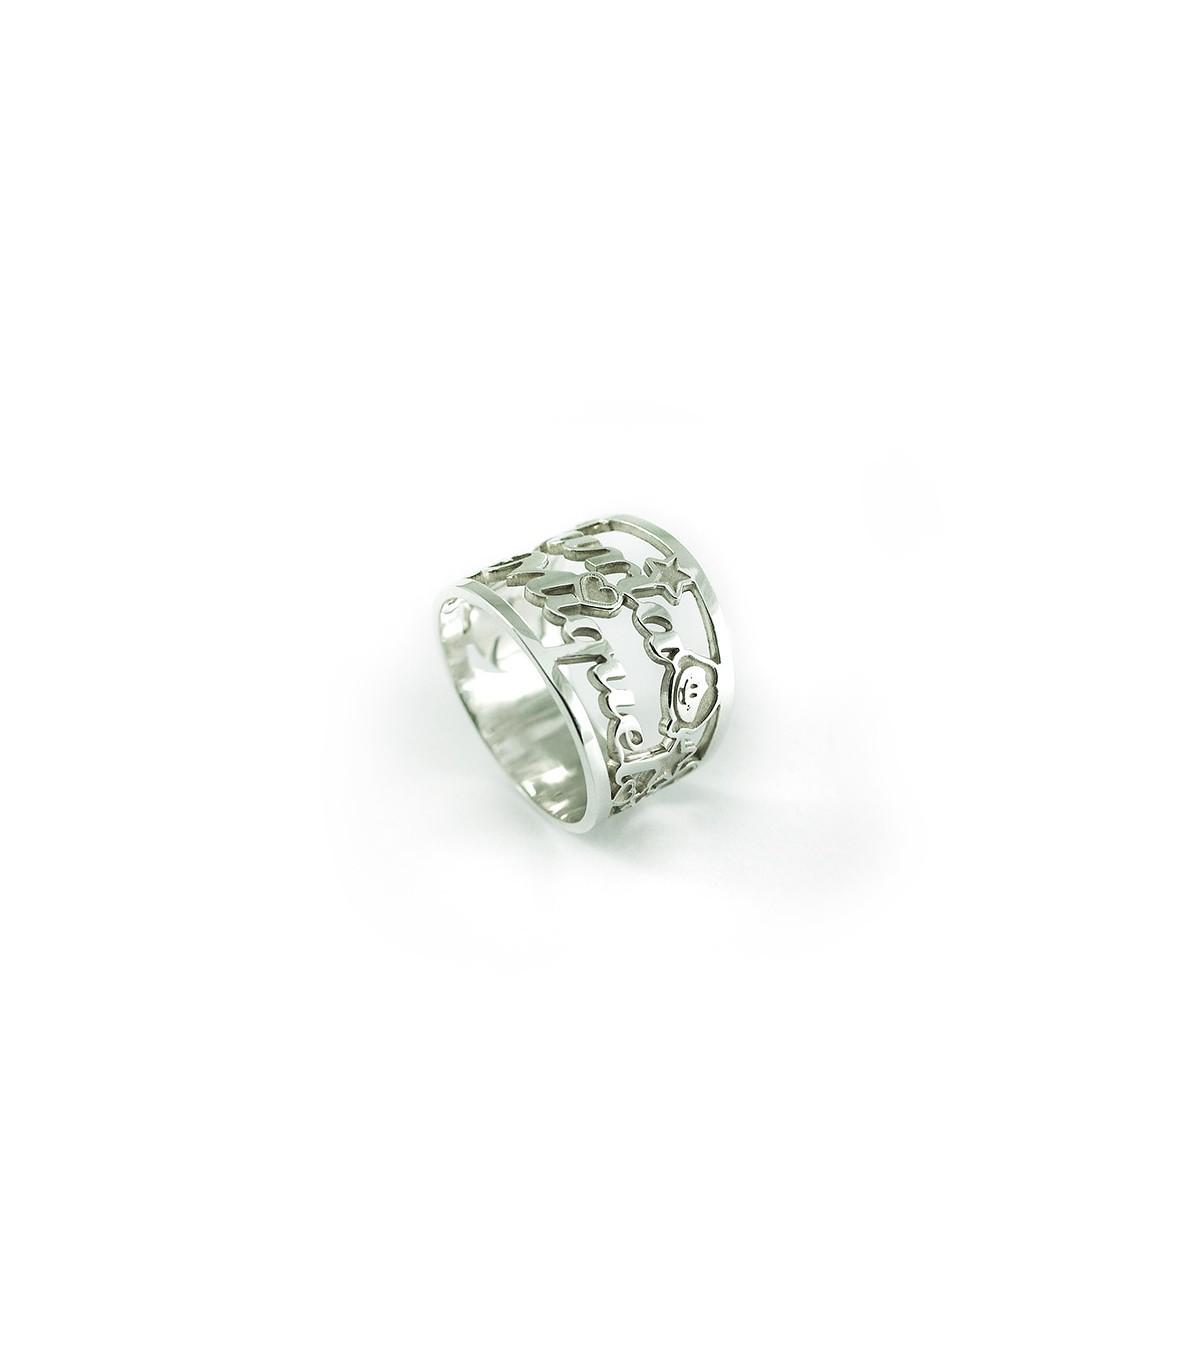 21c0b19d68b8 Anillo de plata personalizado Amore. Joyas para mujer   Platelia